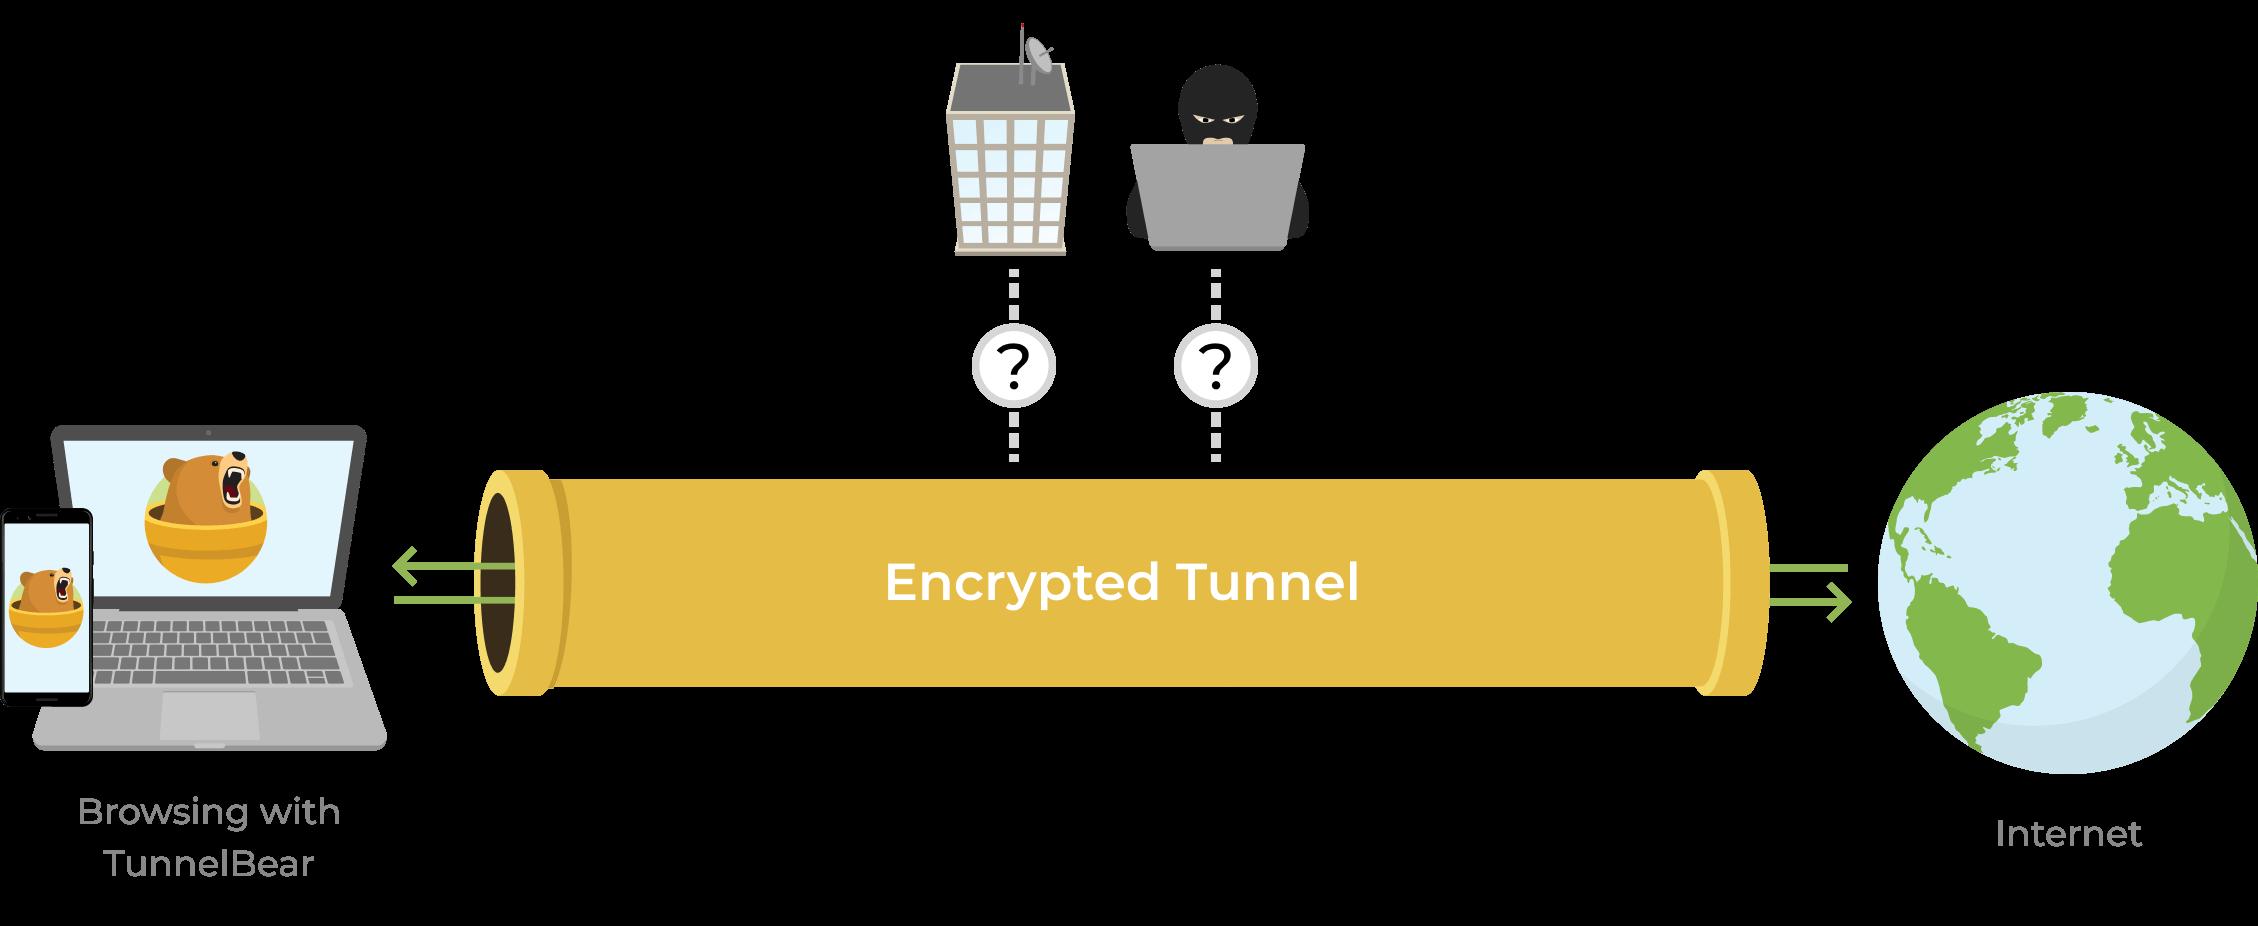 TunnelBear - Encrypt